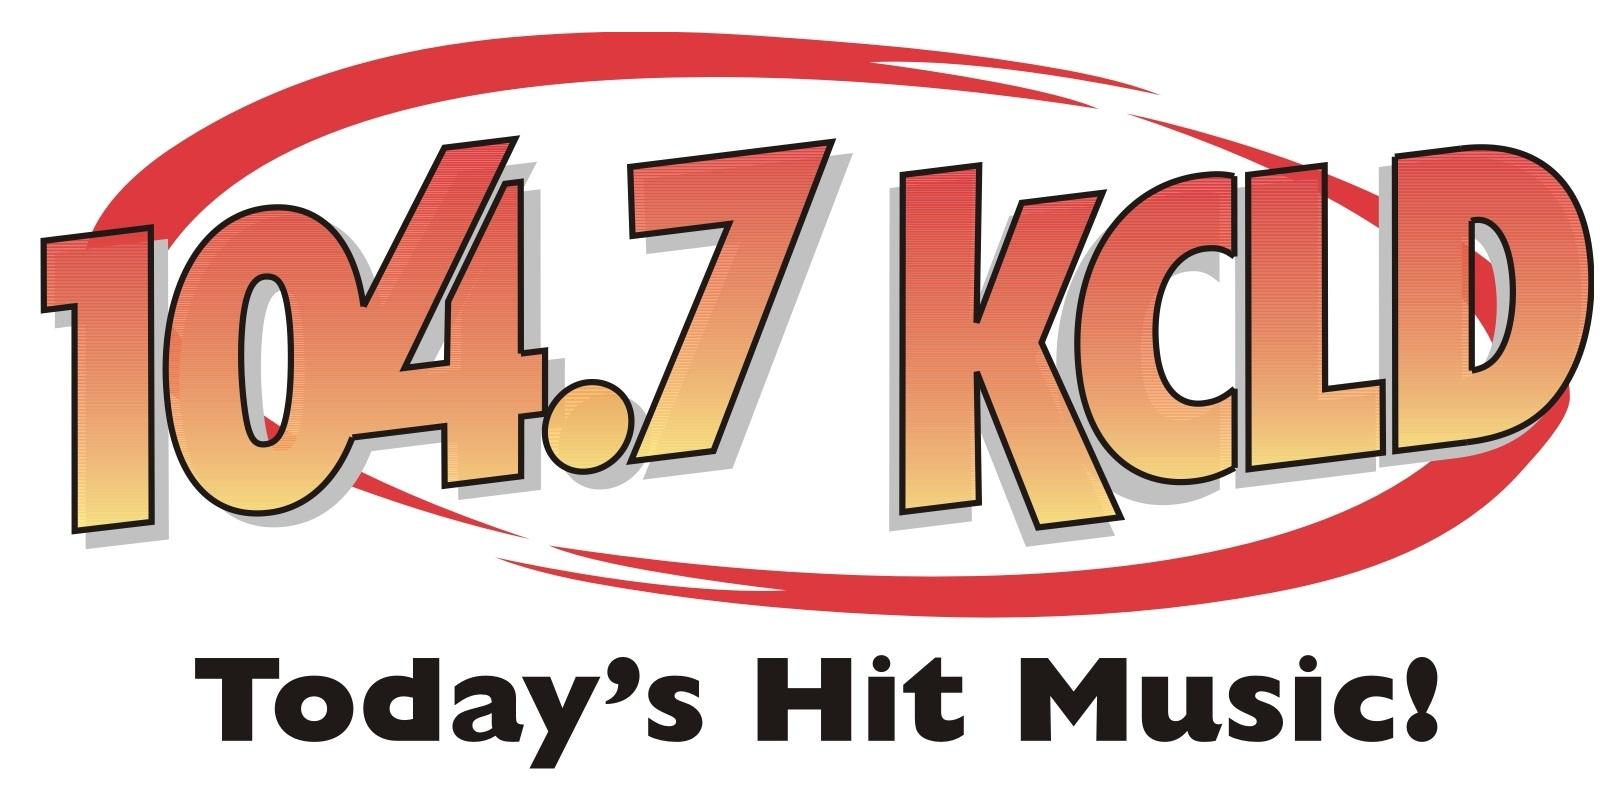 KCLD-FM